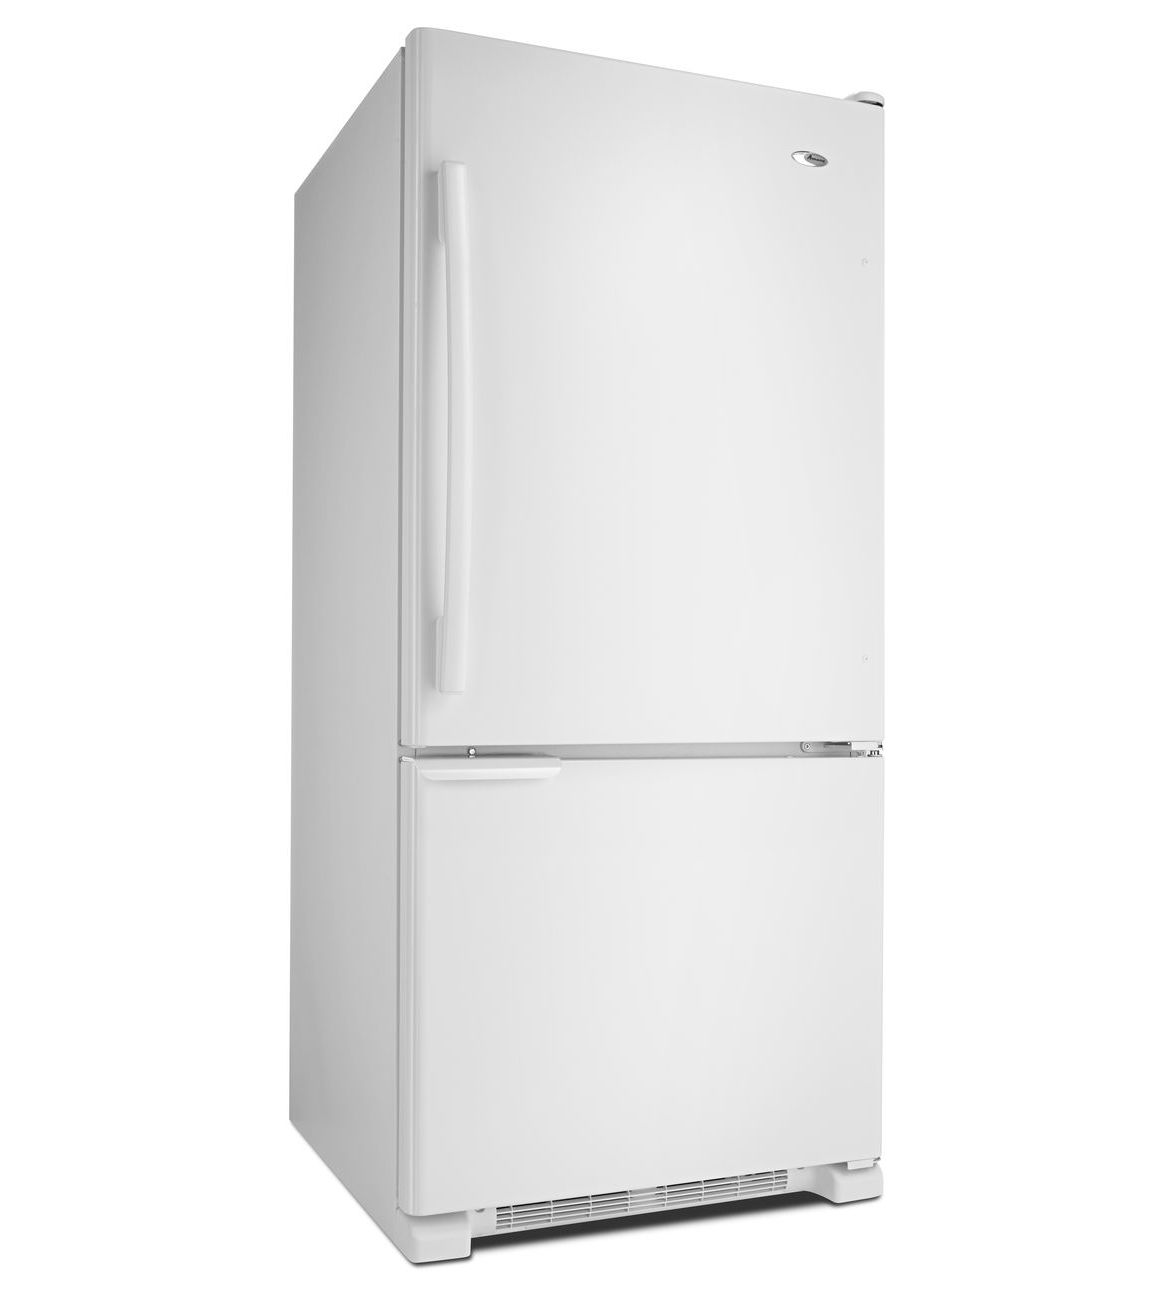 (ABB1921BRW) Amana® 18.5 cu. ft. Bottom-Freezer ... Amana Appliances